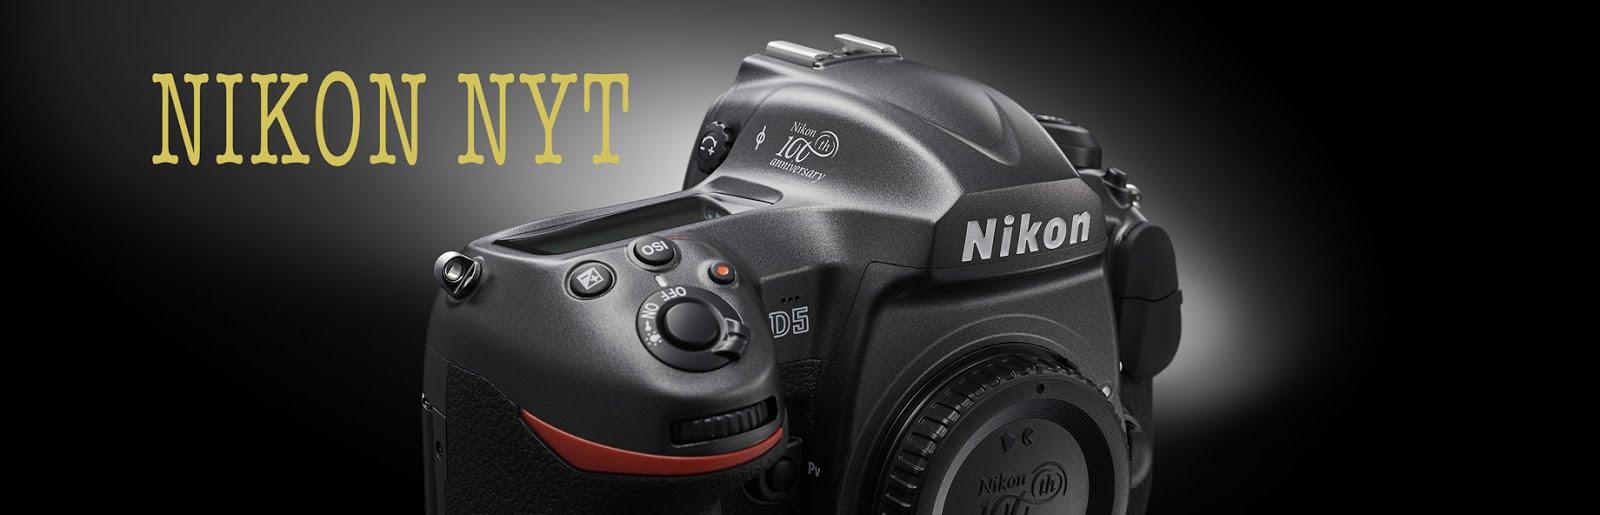 Nikon Nyt